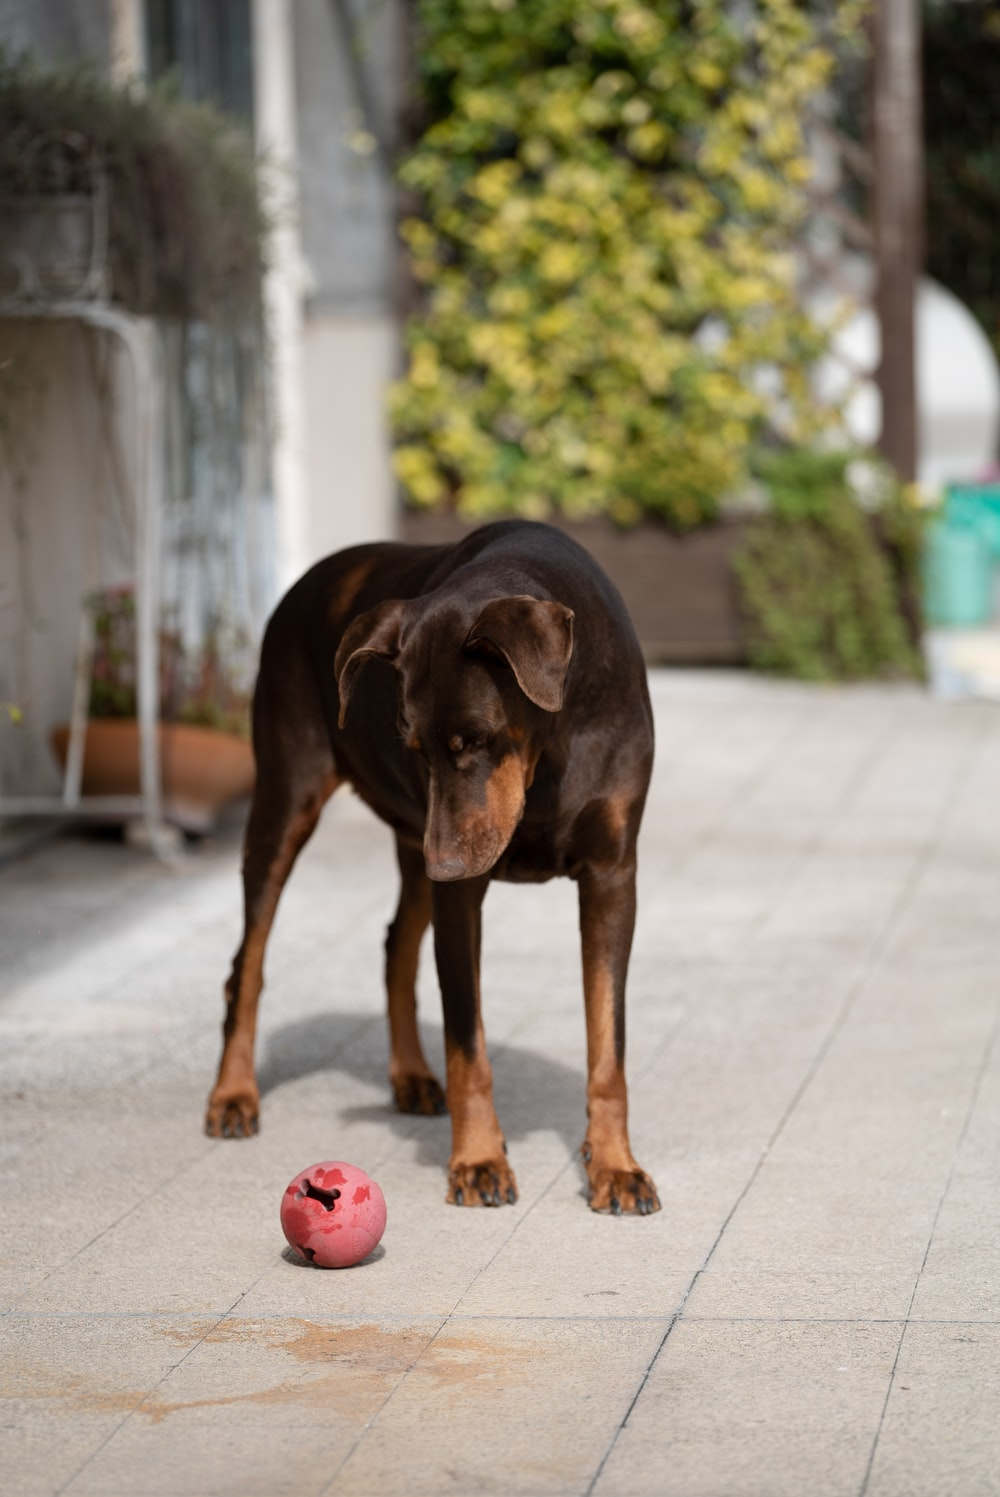 black and tan short coat medium sized dog on grey concrete pavement during daytime